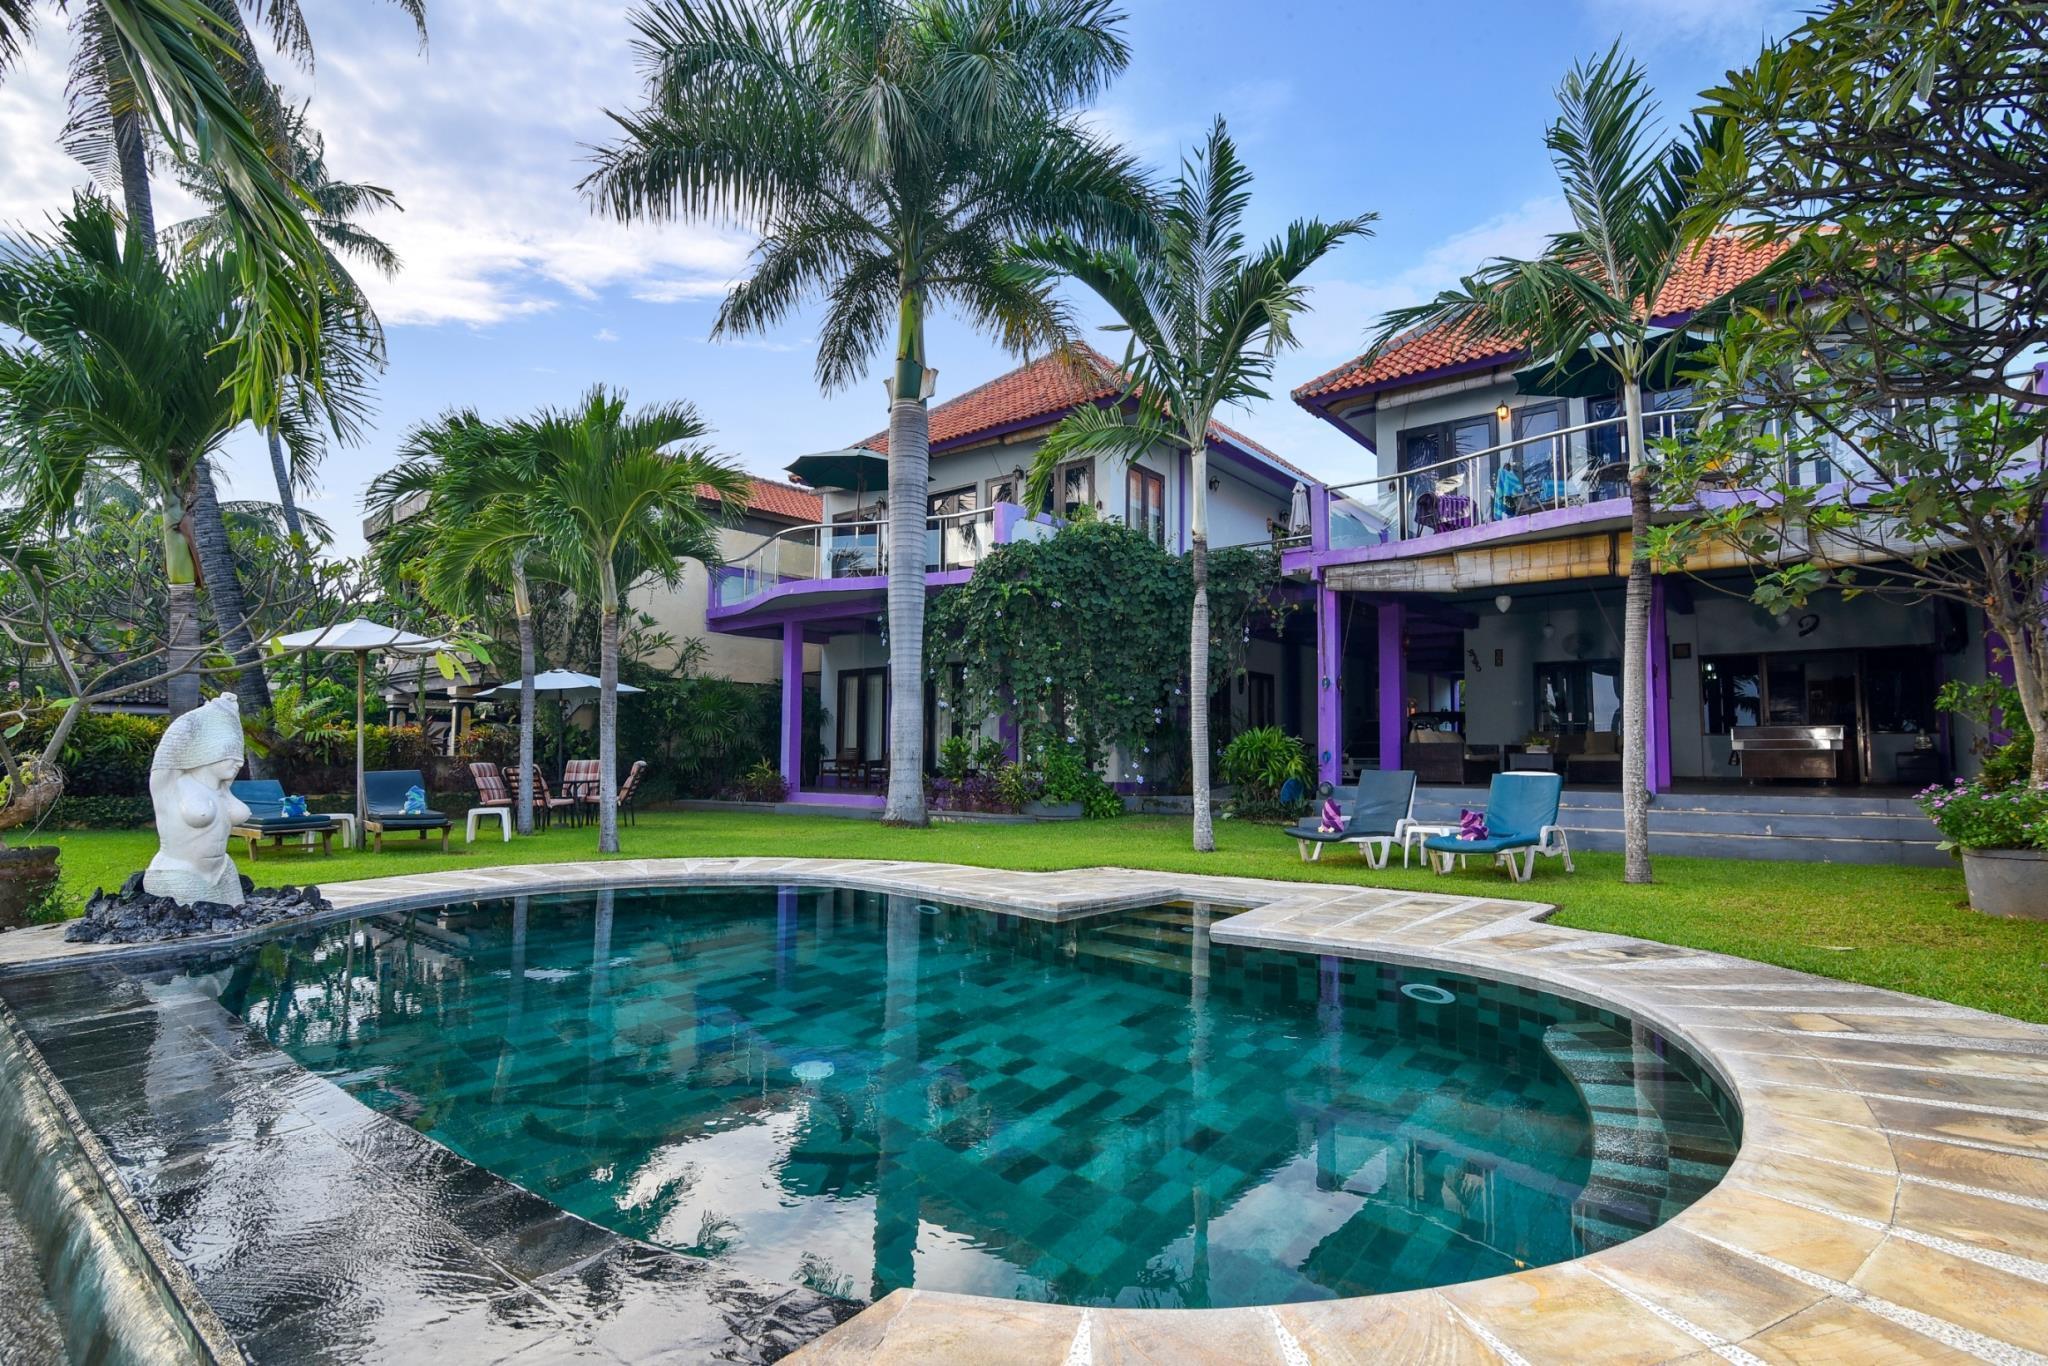 Dolphin Beach Bali Villas ホテル詳細